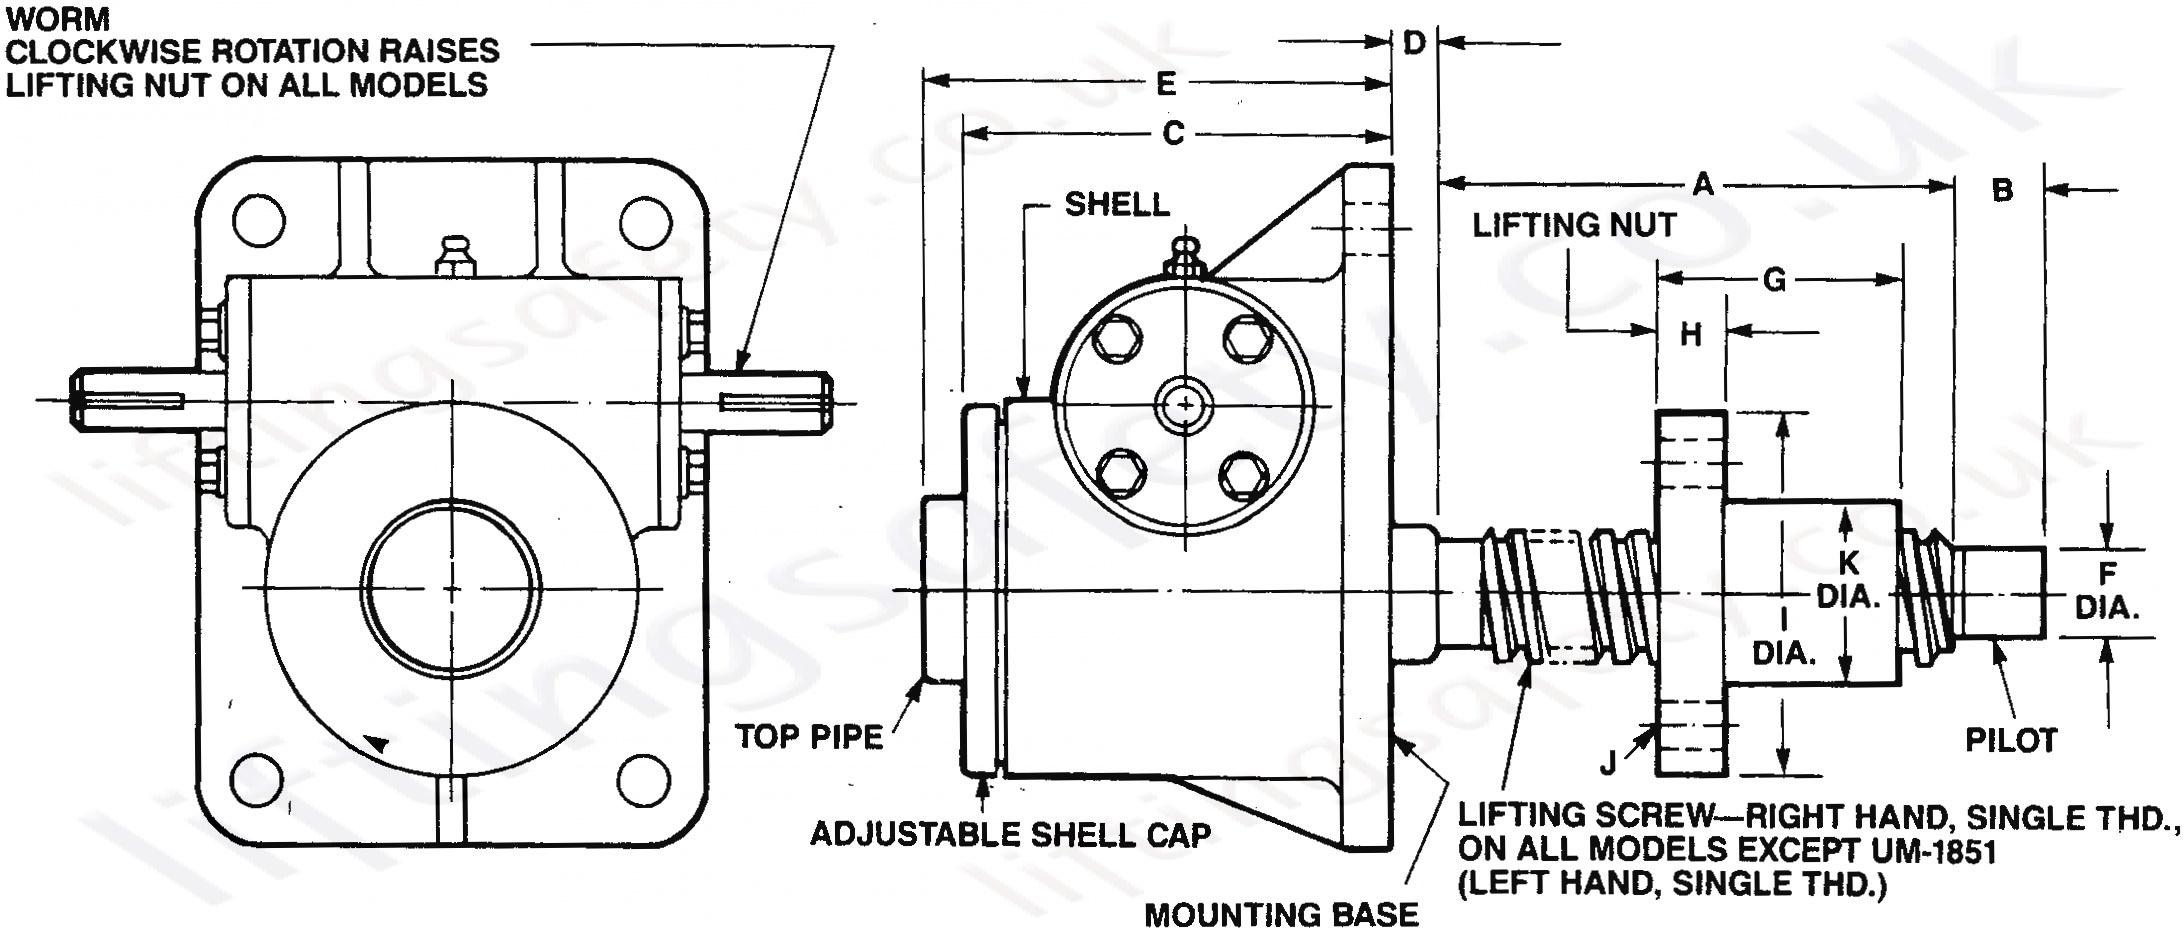 Machine Screwjack Actuator 2t To 150t